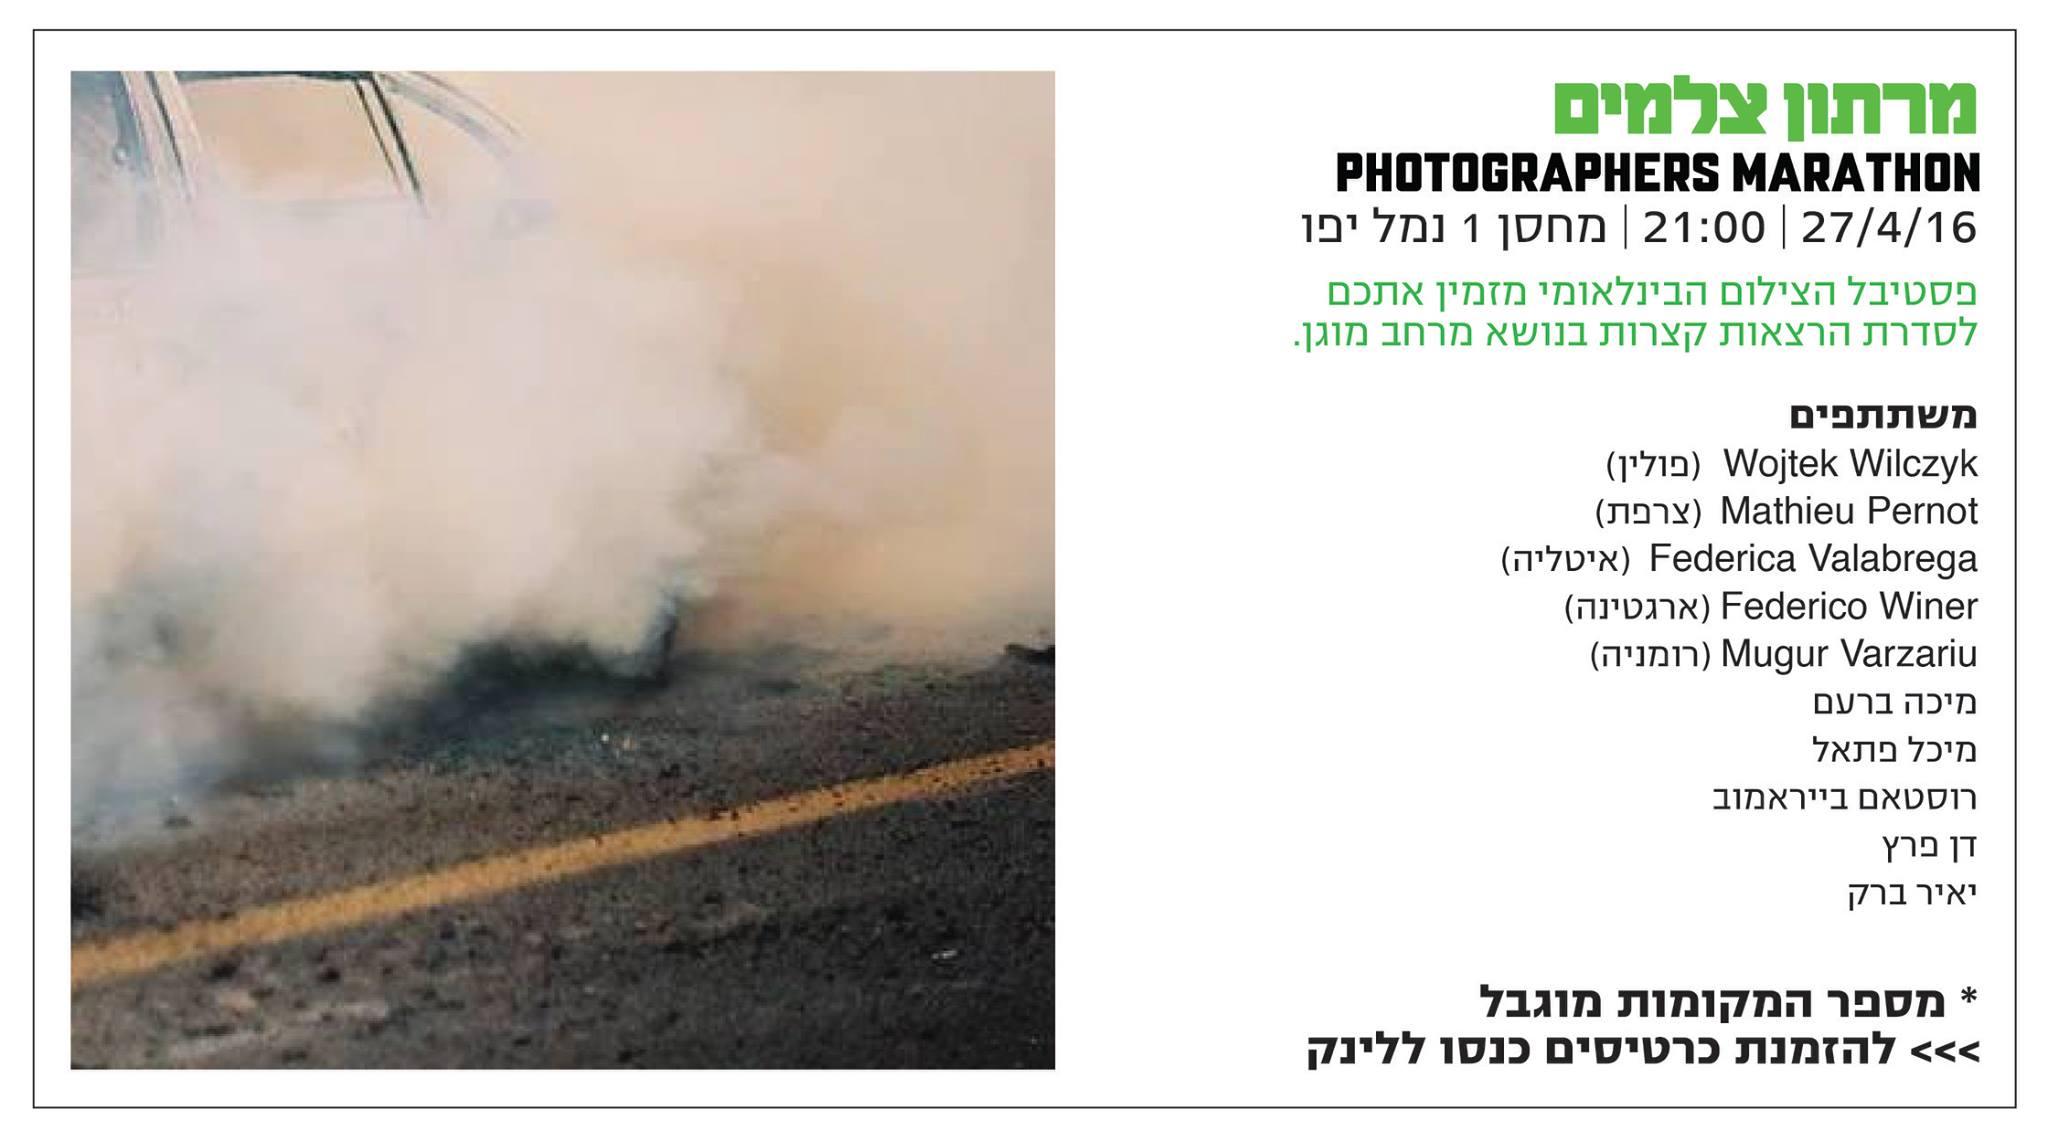 International Photography Festival Tel Aviv 2016, Federico Winer's Ultradistancia Photographer Marathon invitation card